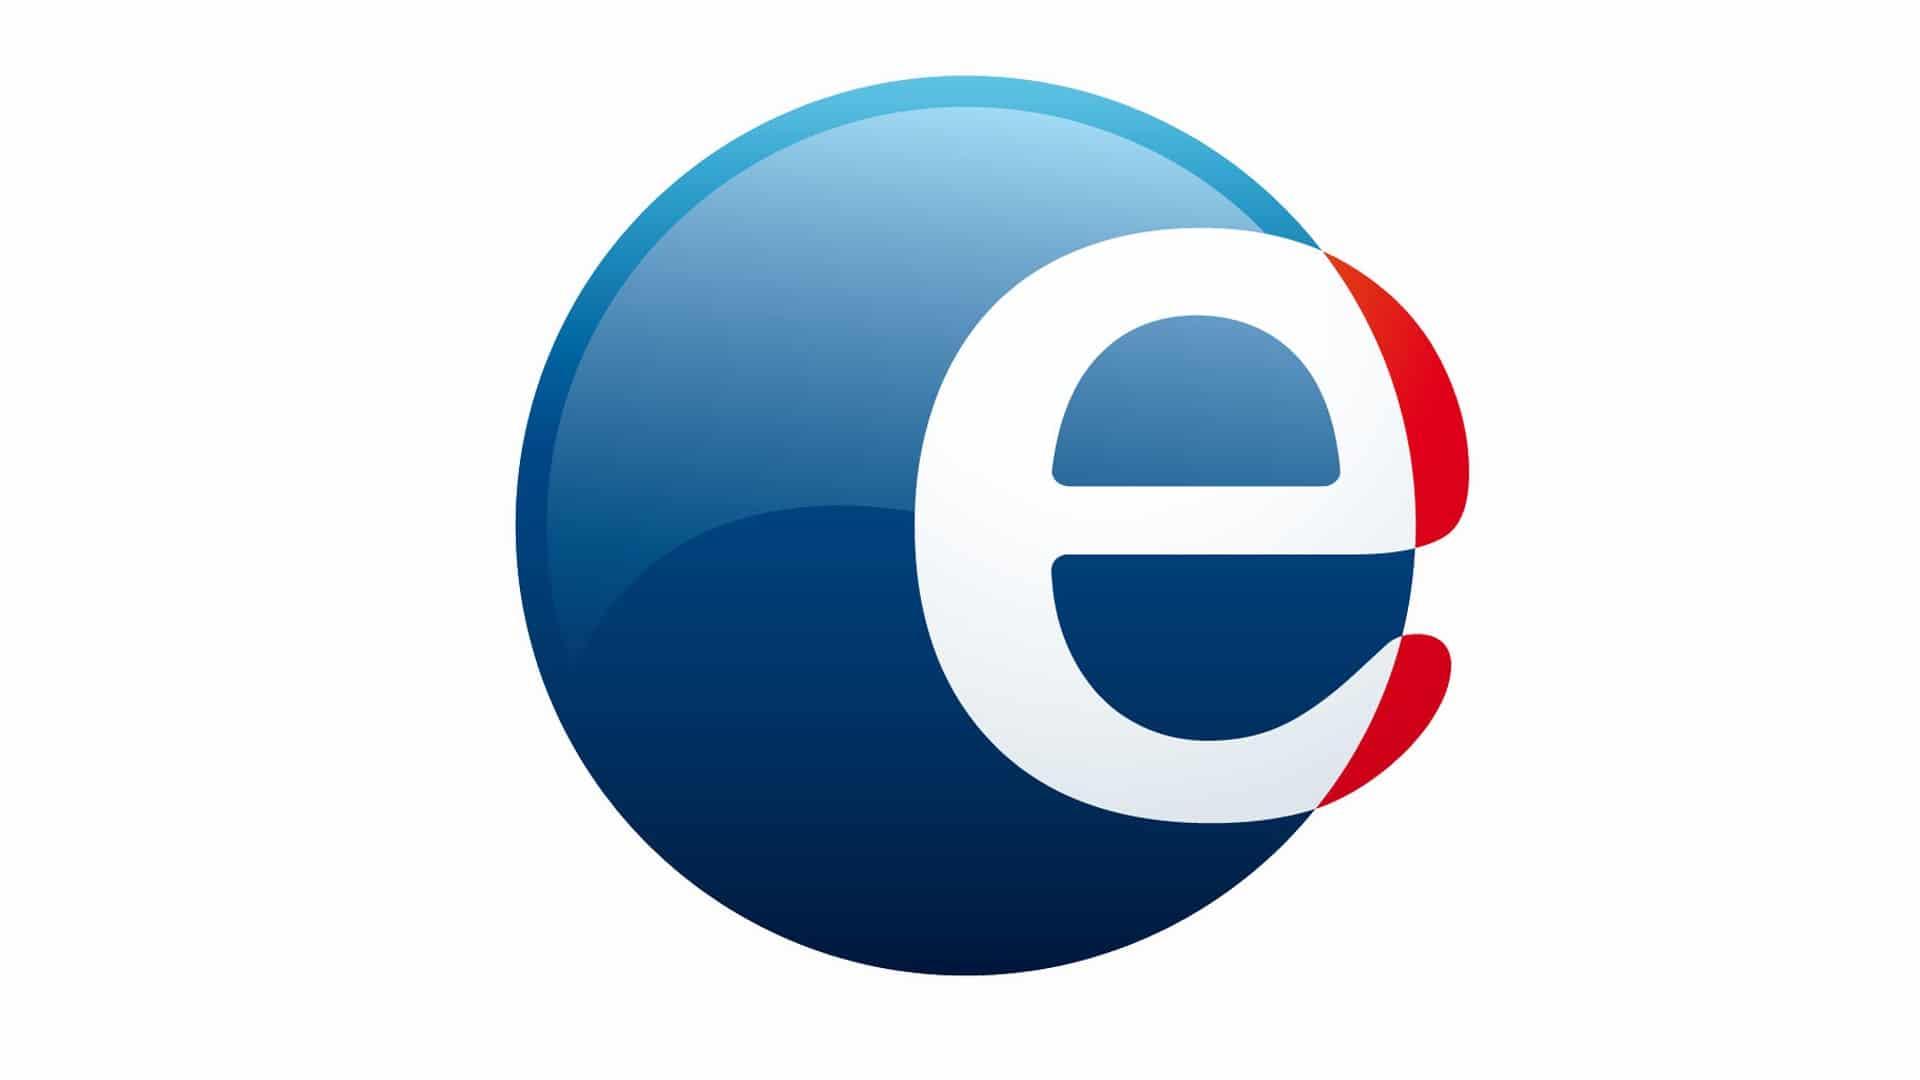 p u00f4le emploi logo histoire et signification  evolution  symbole p u00f4le emploi